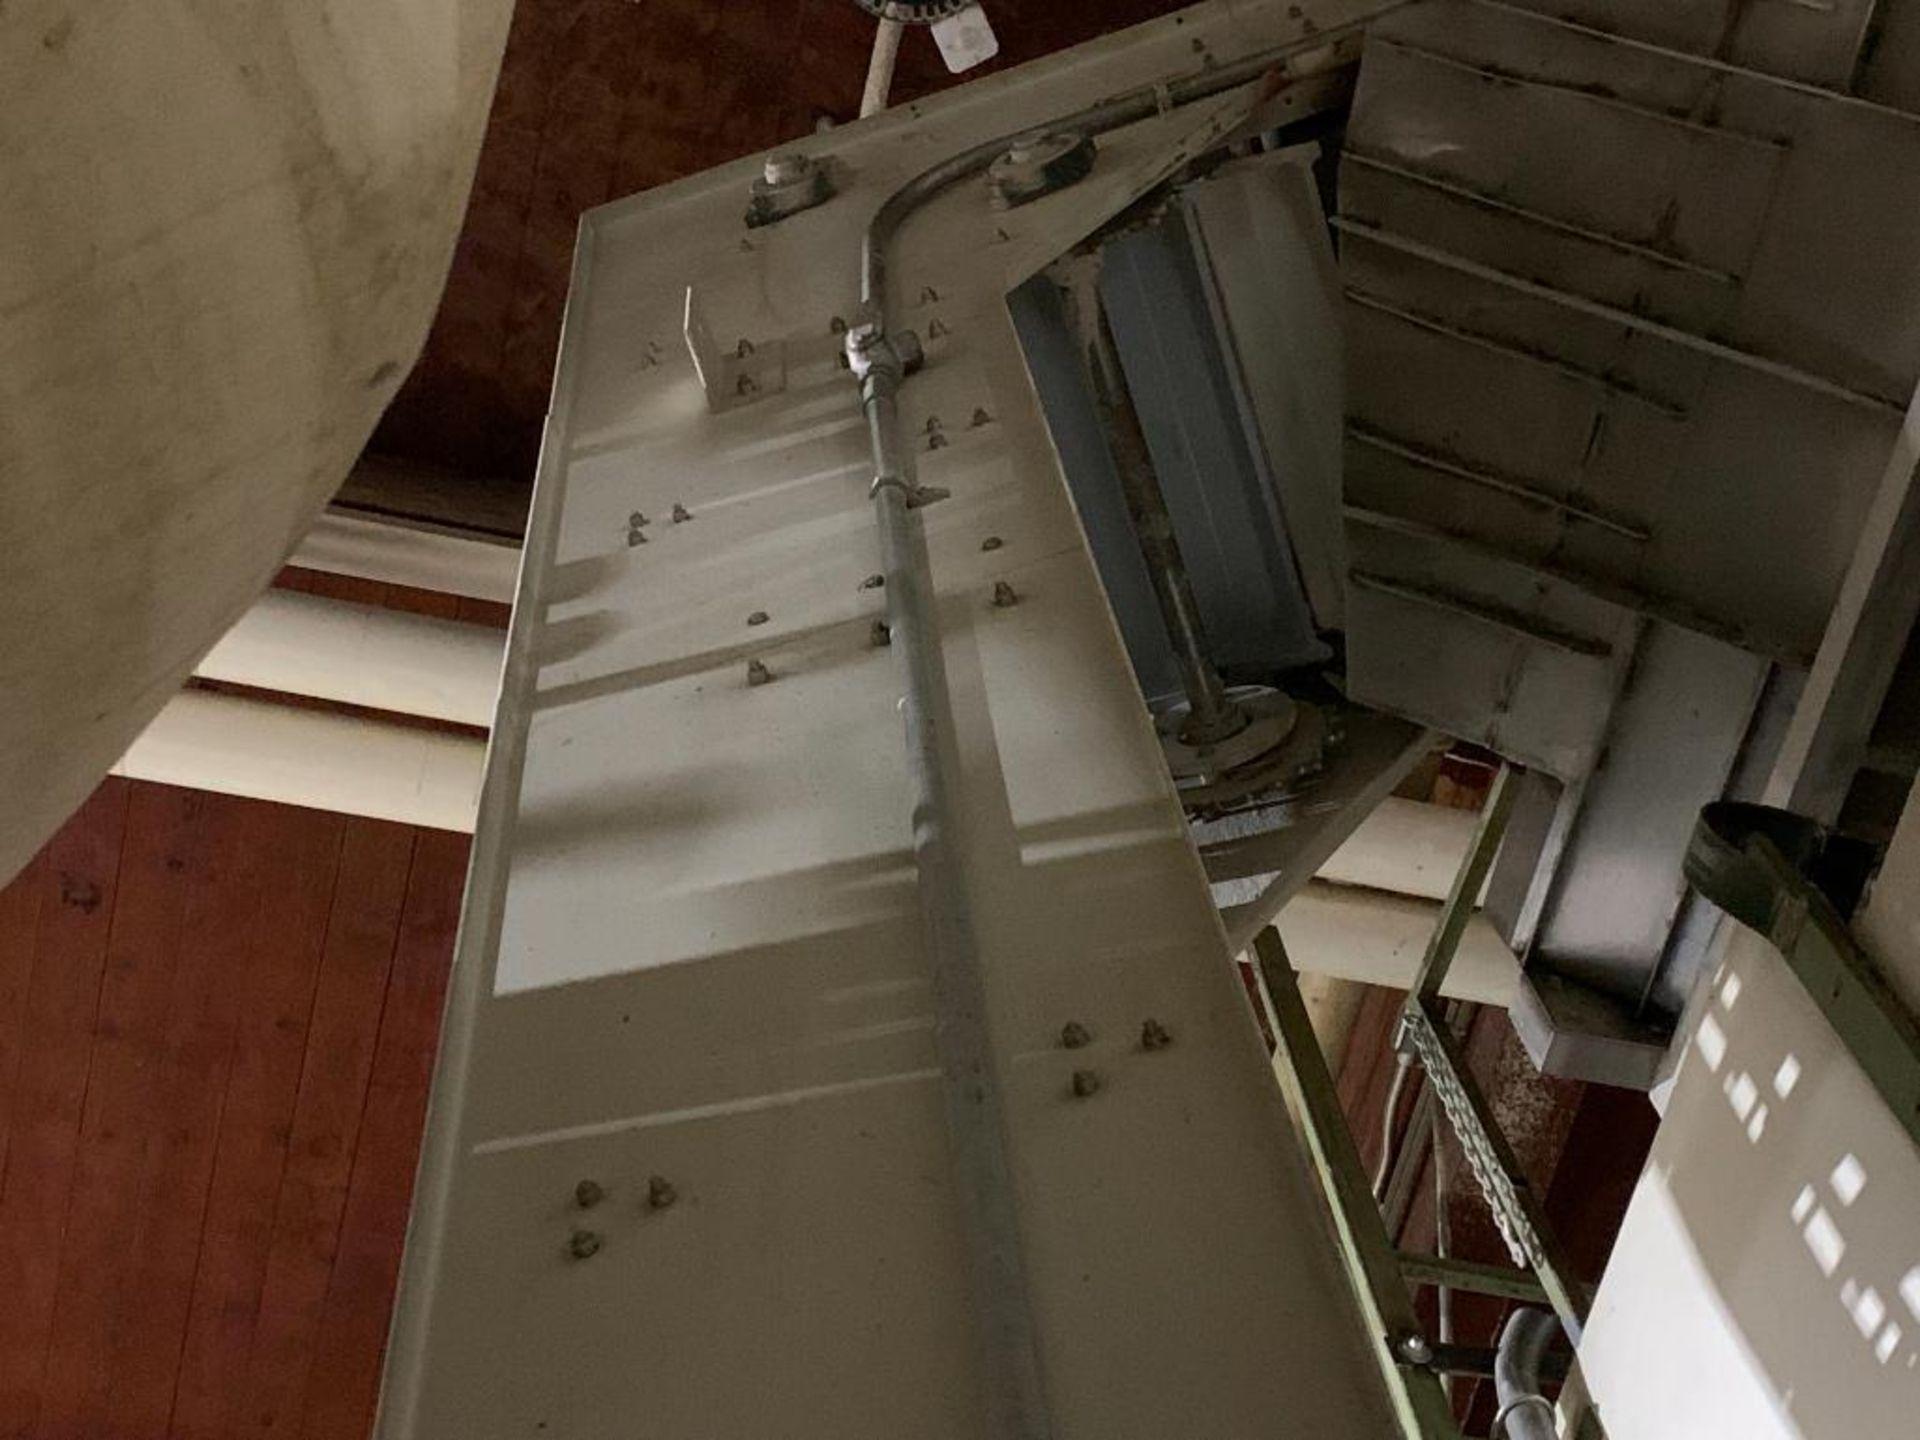 Meyer overlapping bucket elevator, model PA462-24-S - Image 11 of 14